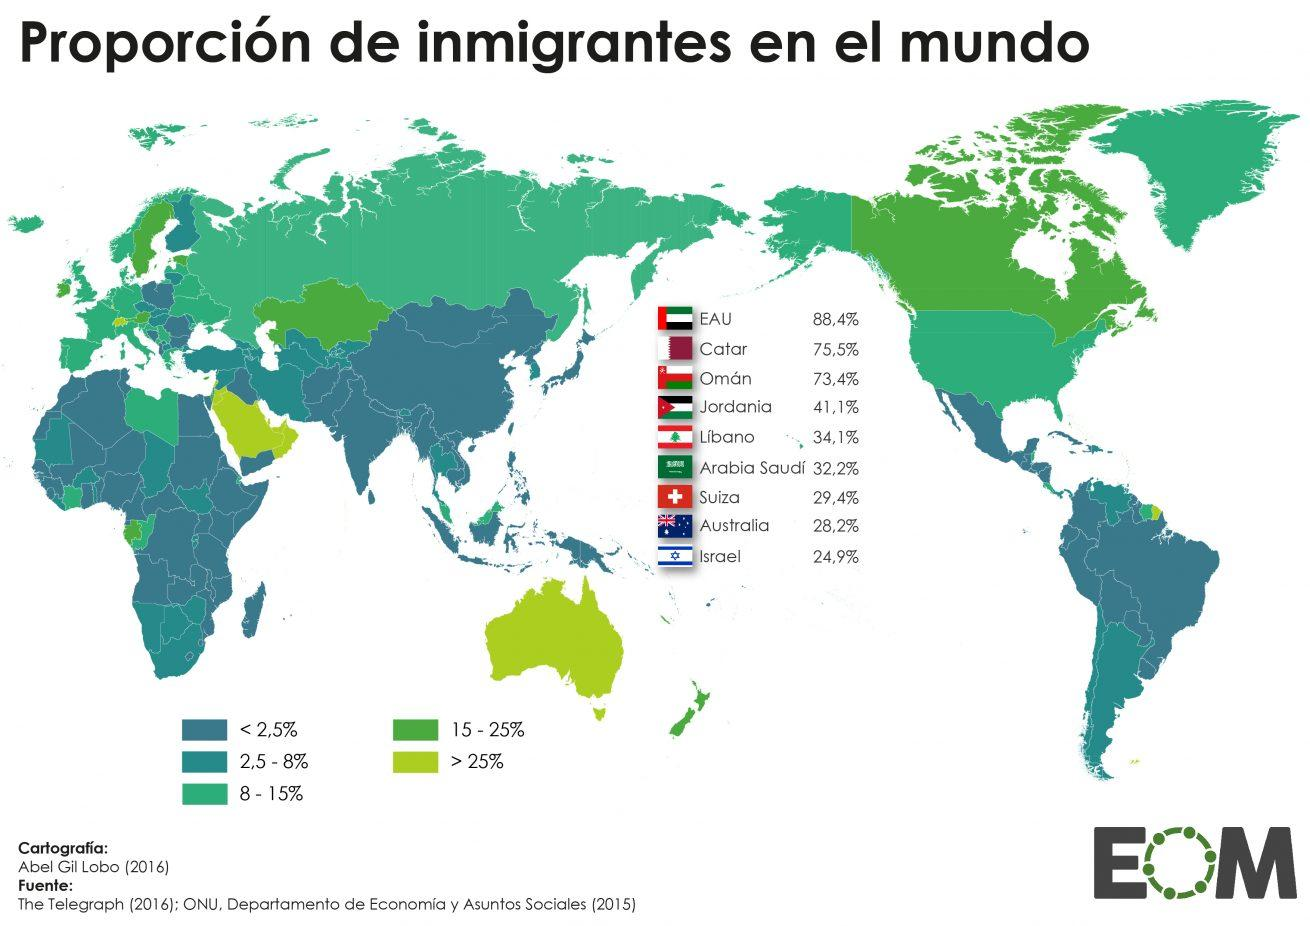 http://elordenmundial.com/wp-content/uploads/2018/05/Mundo-Poblaci%C3%B3n-Inmigraci%C3%B3n-Mapa-01-1310x926.jpg